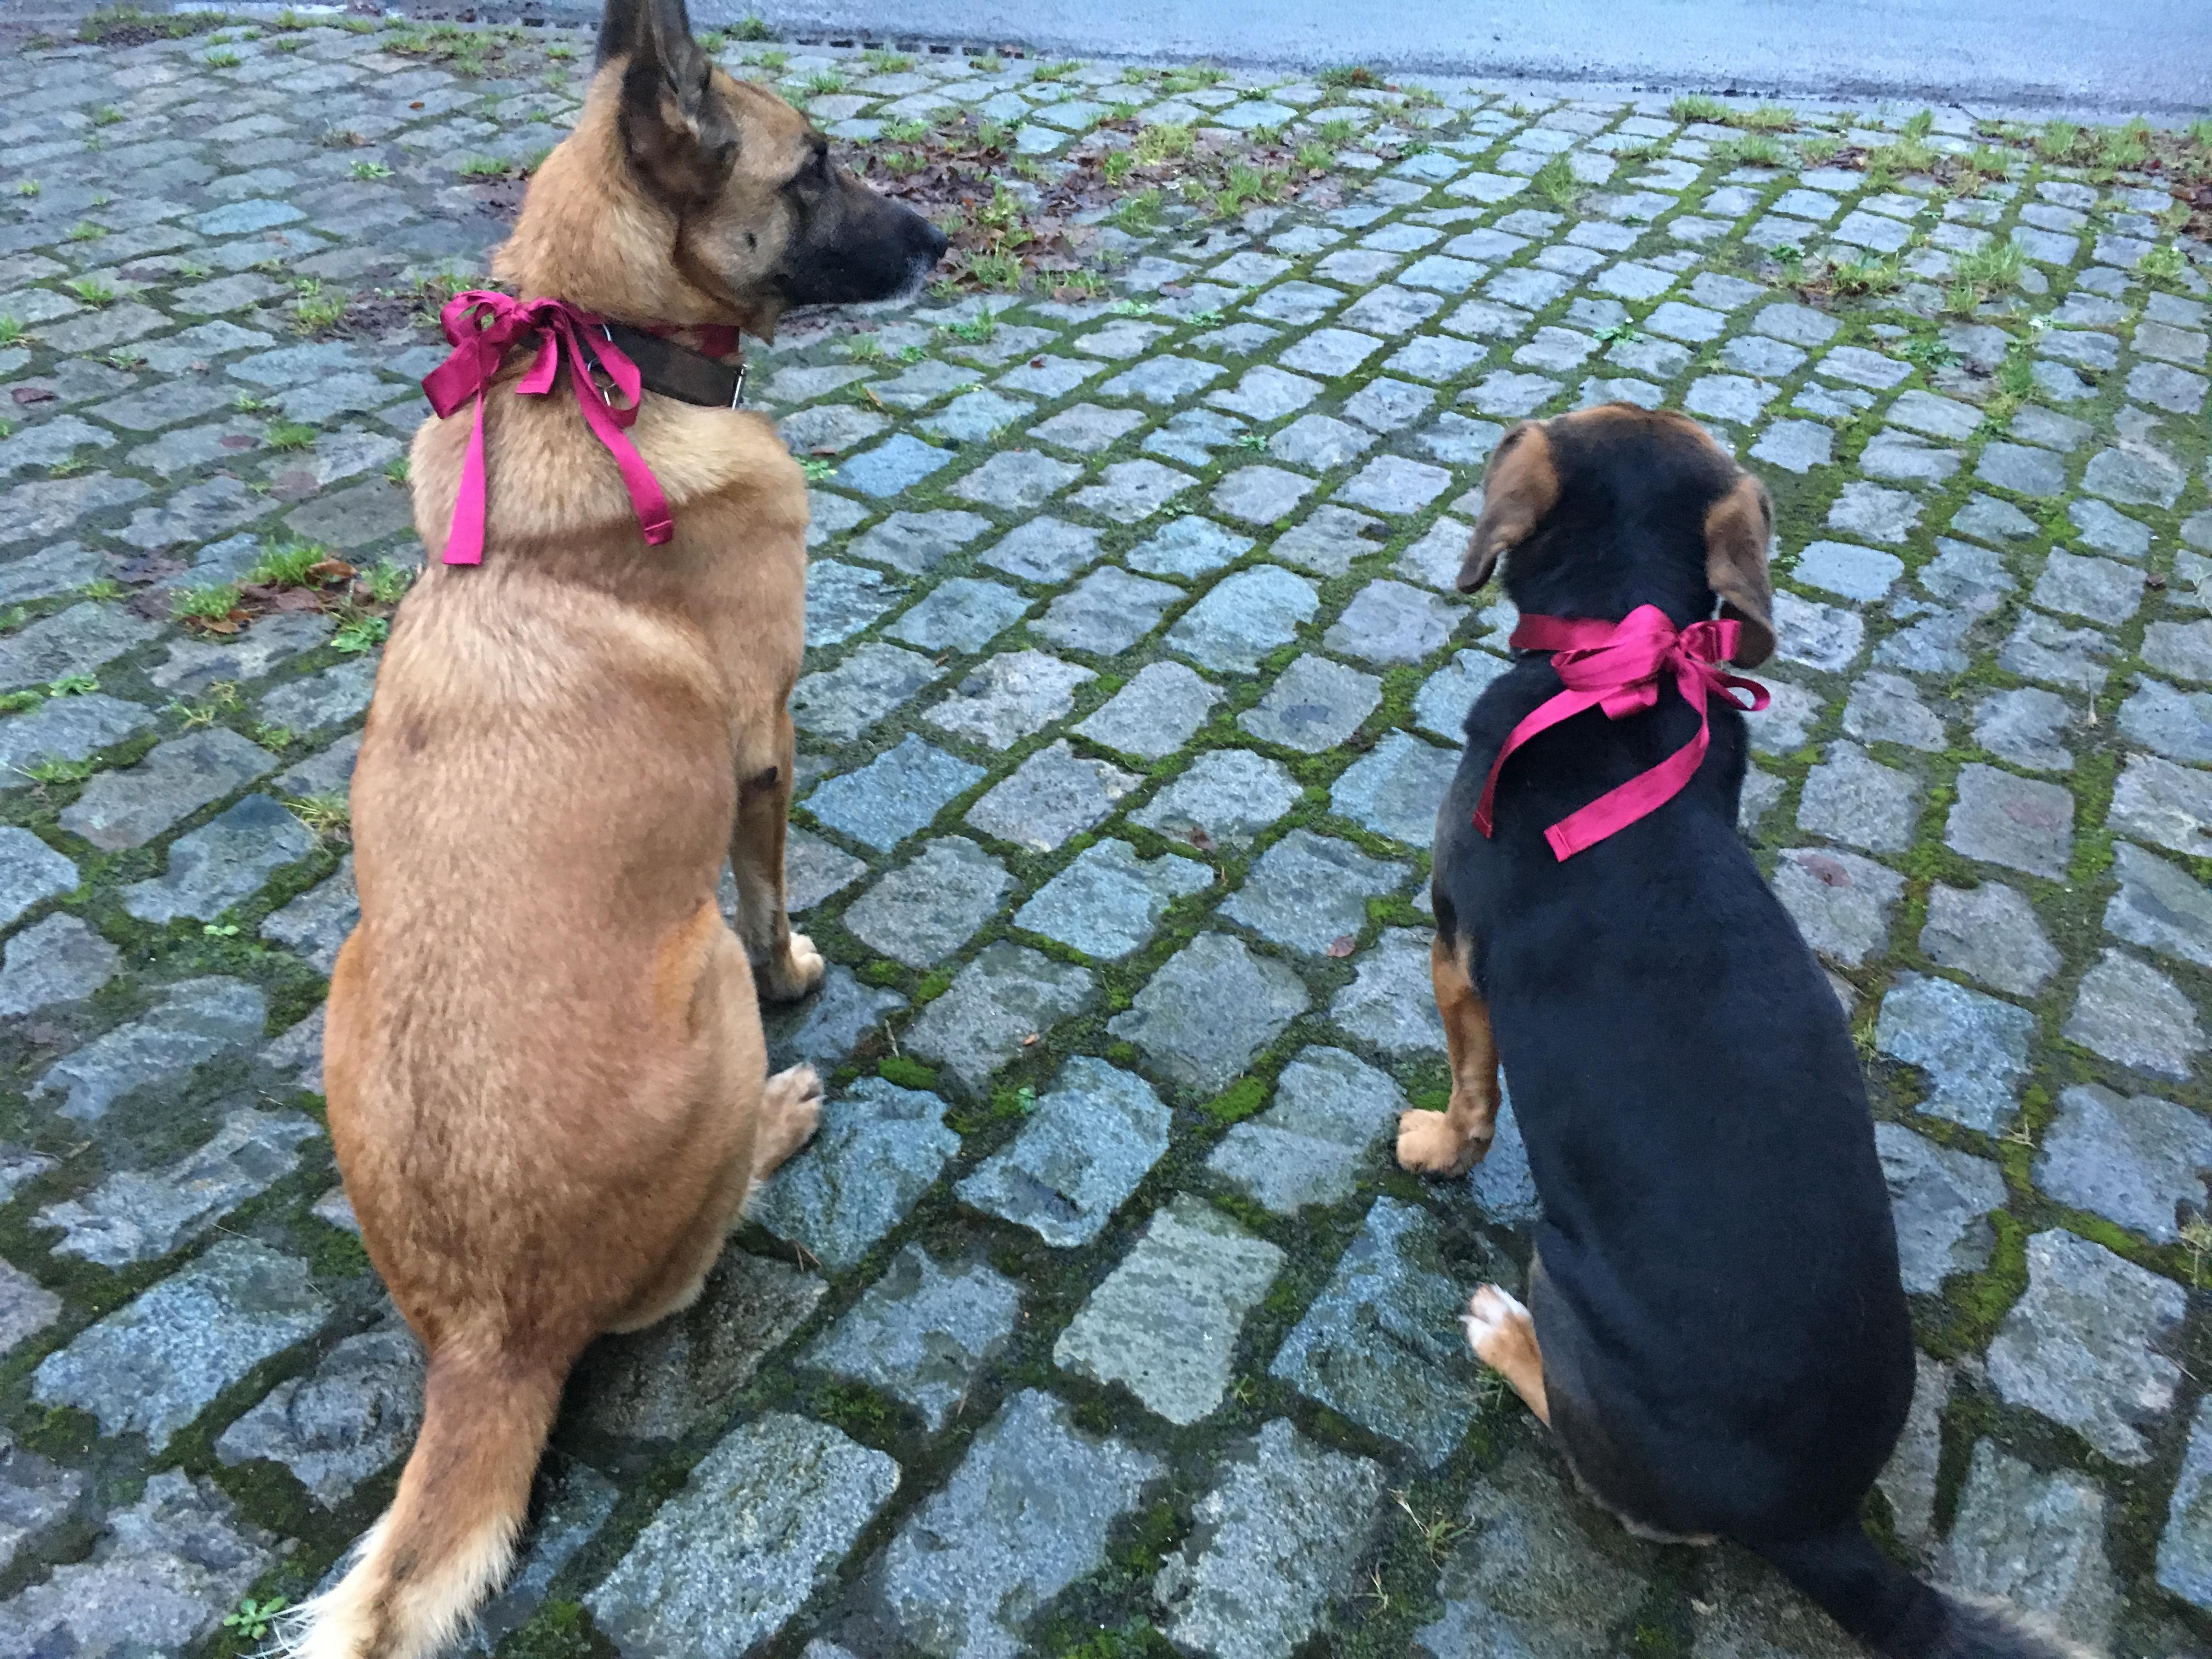 Kheops et Khephren à la balade canine de Noël